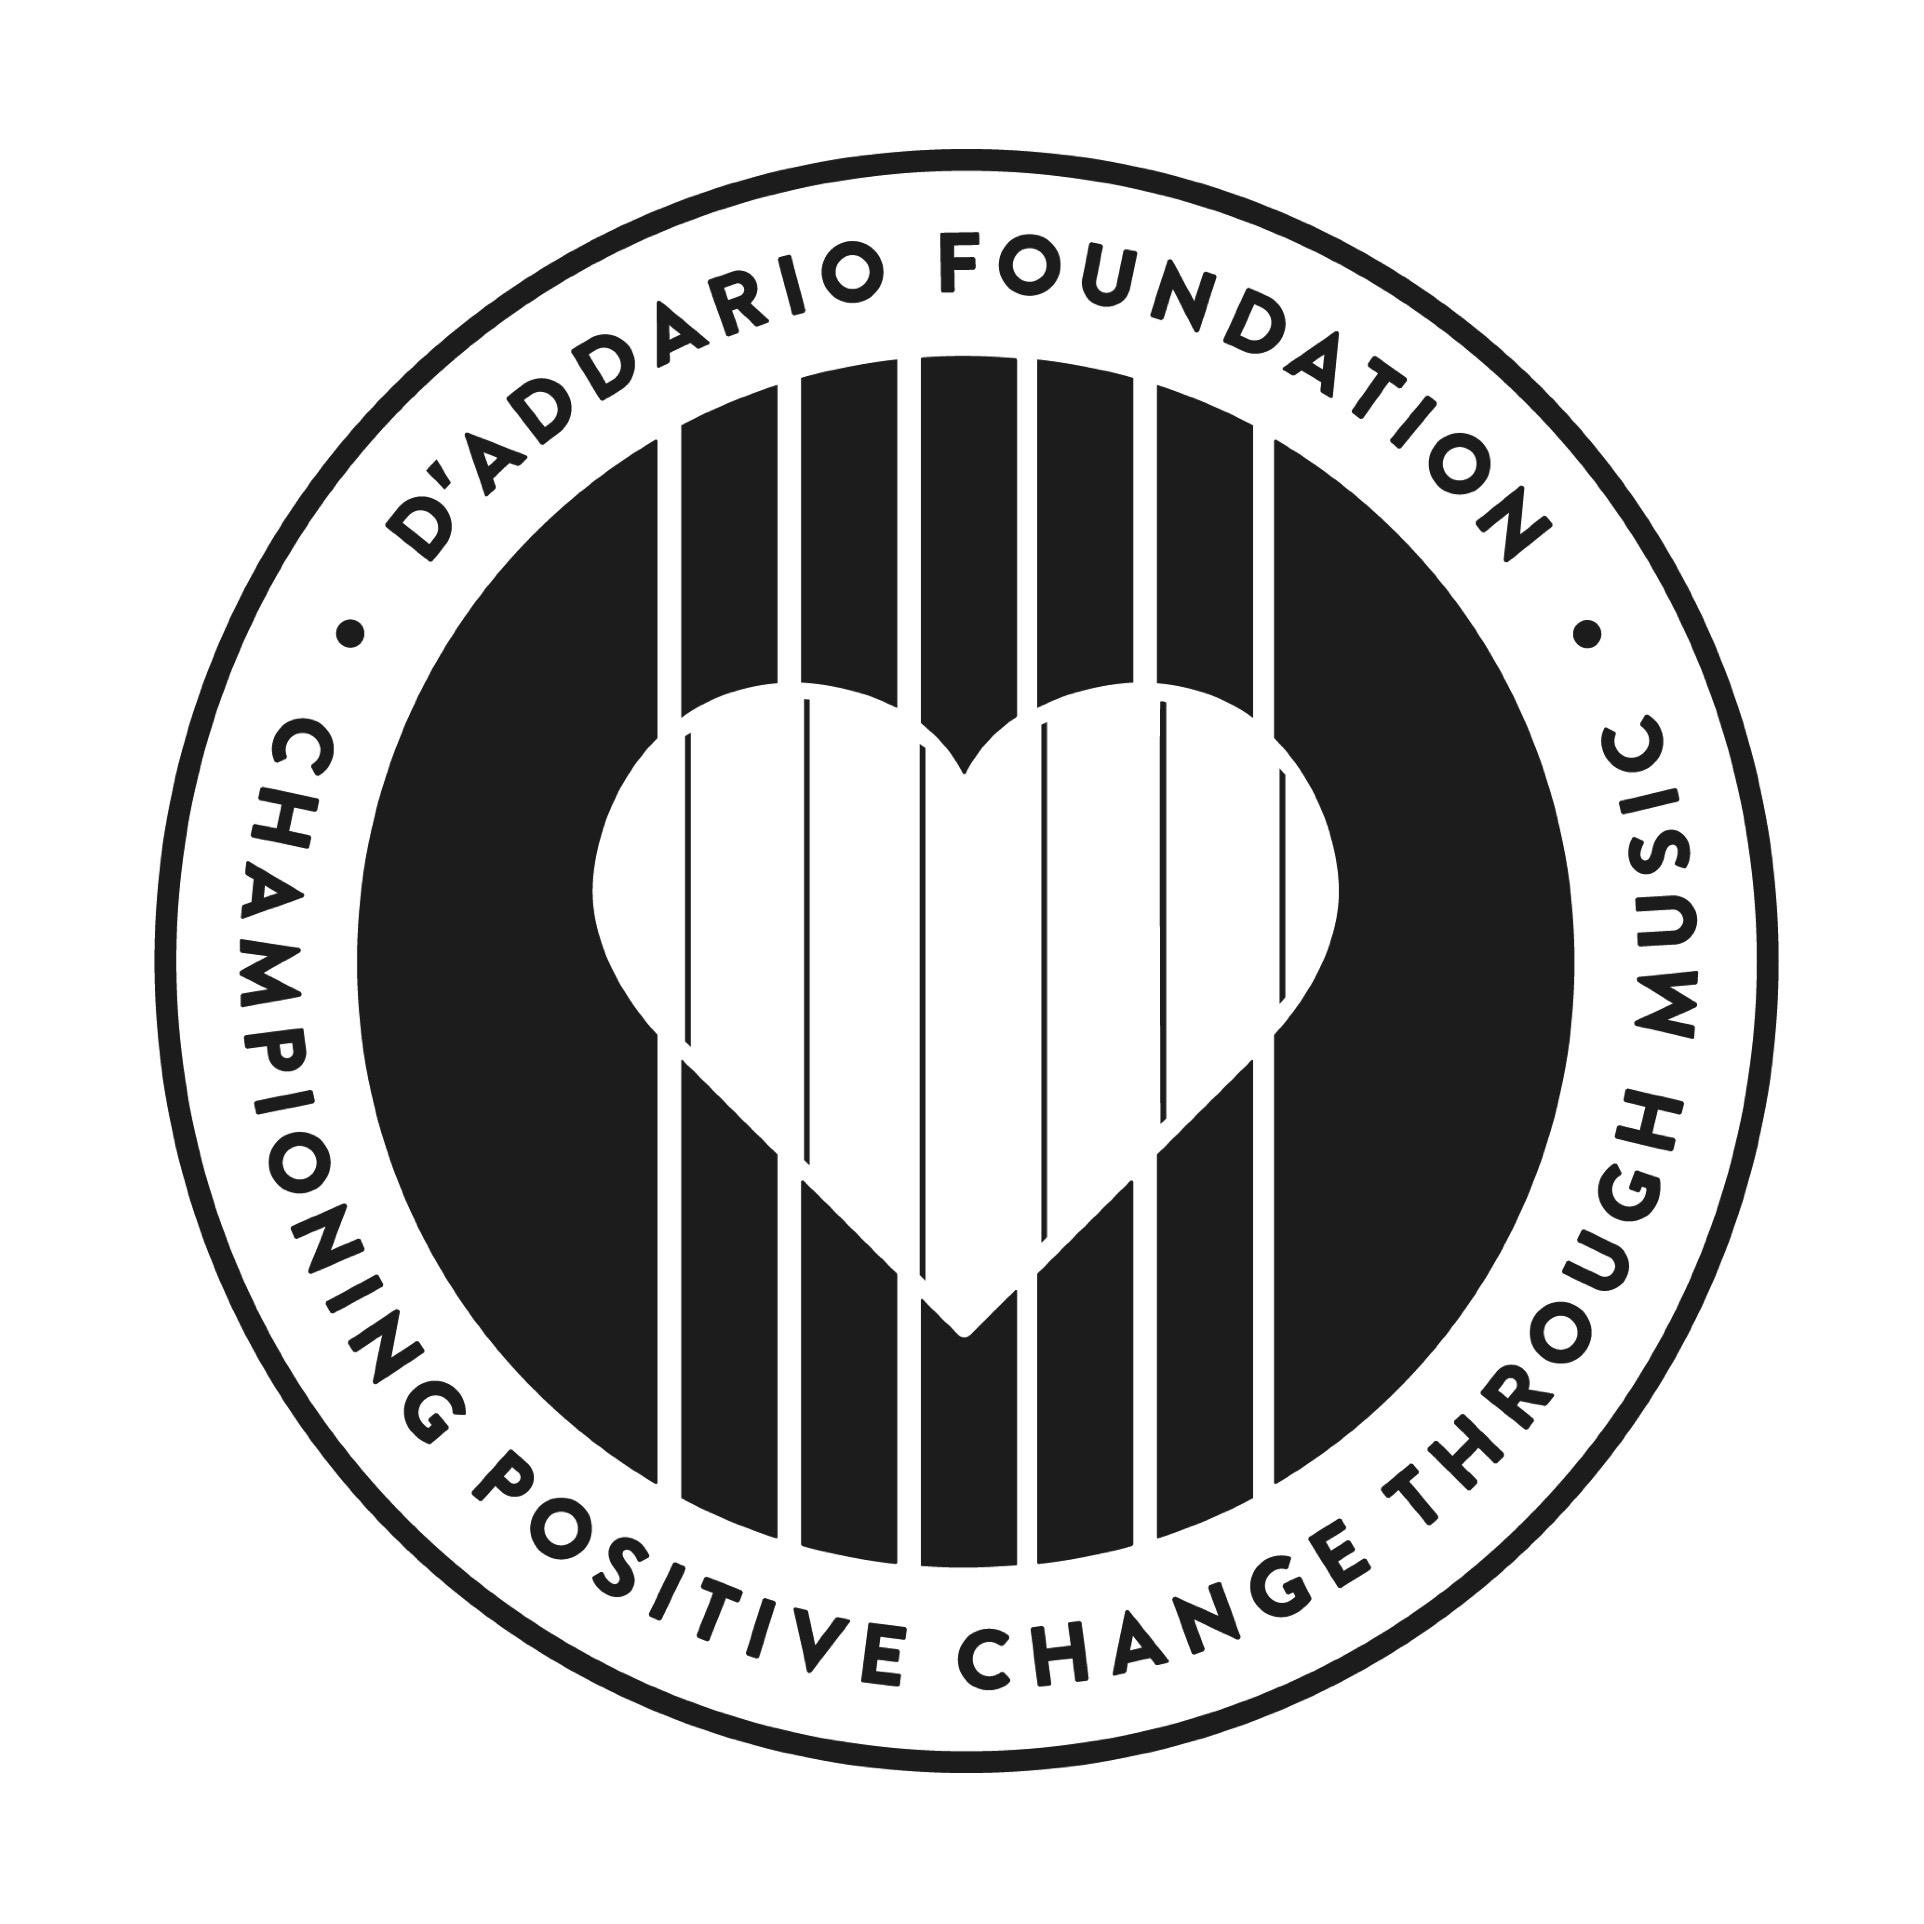 D'Addario Black circle logo.jpg